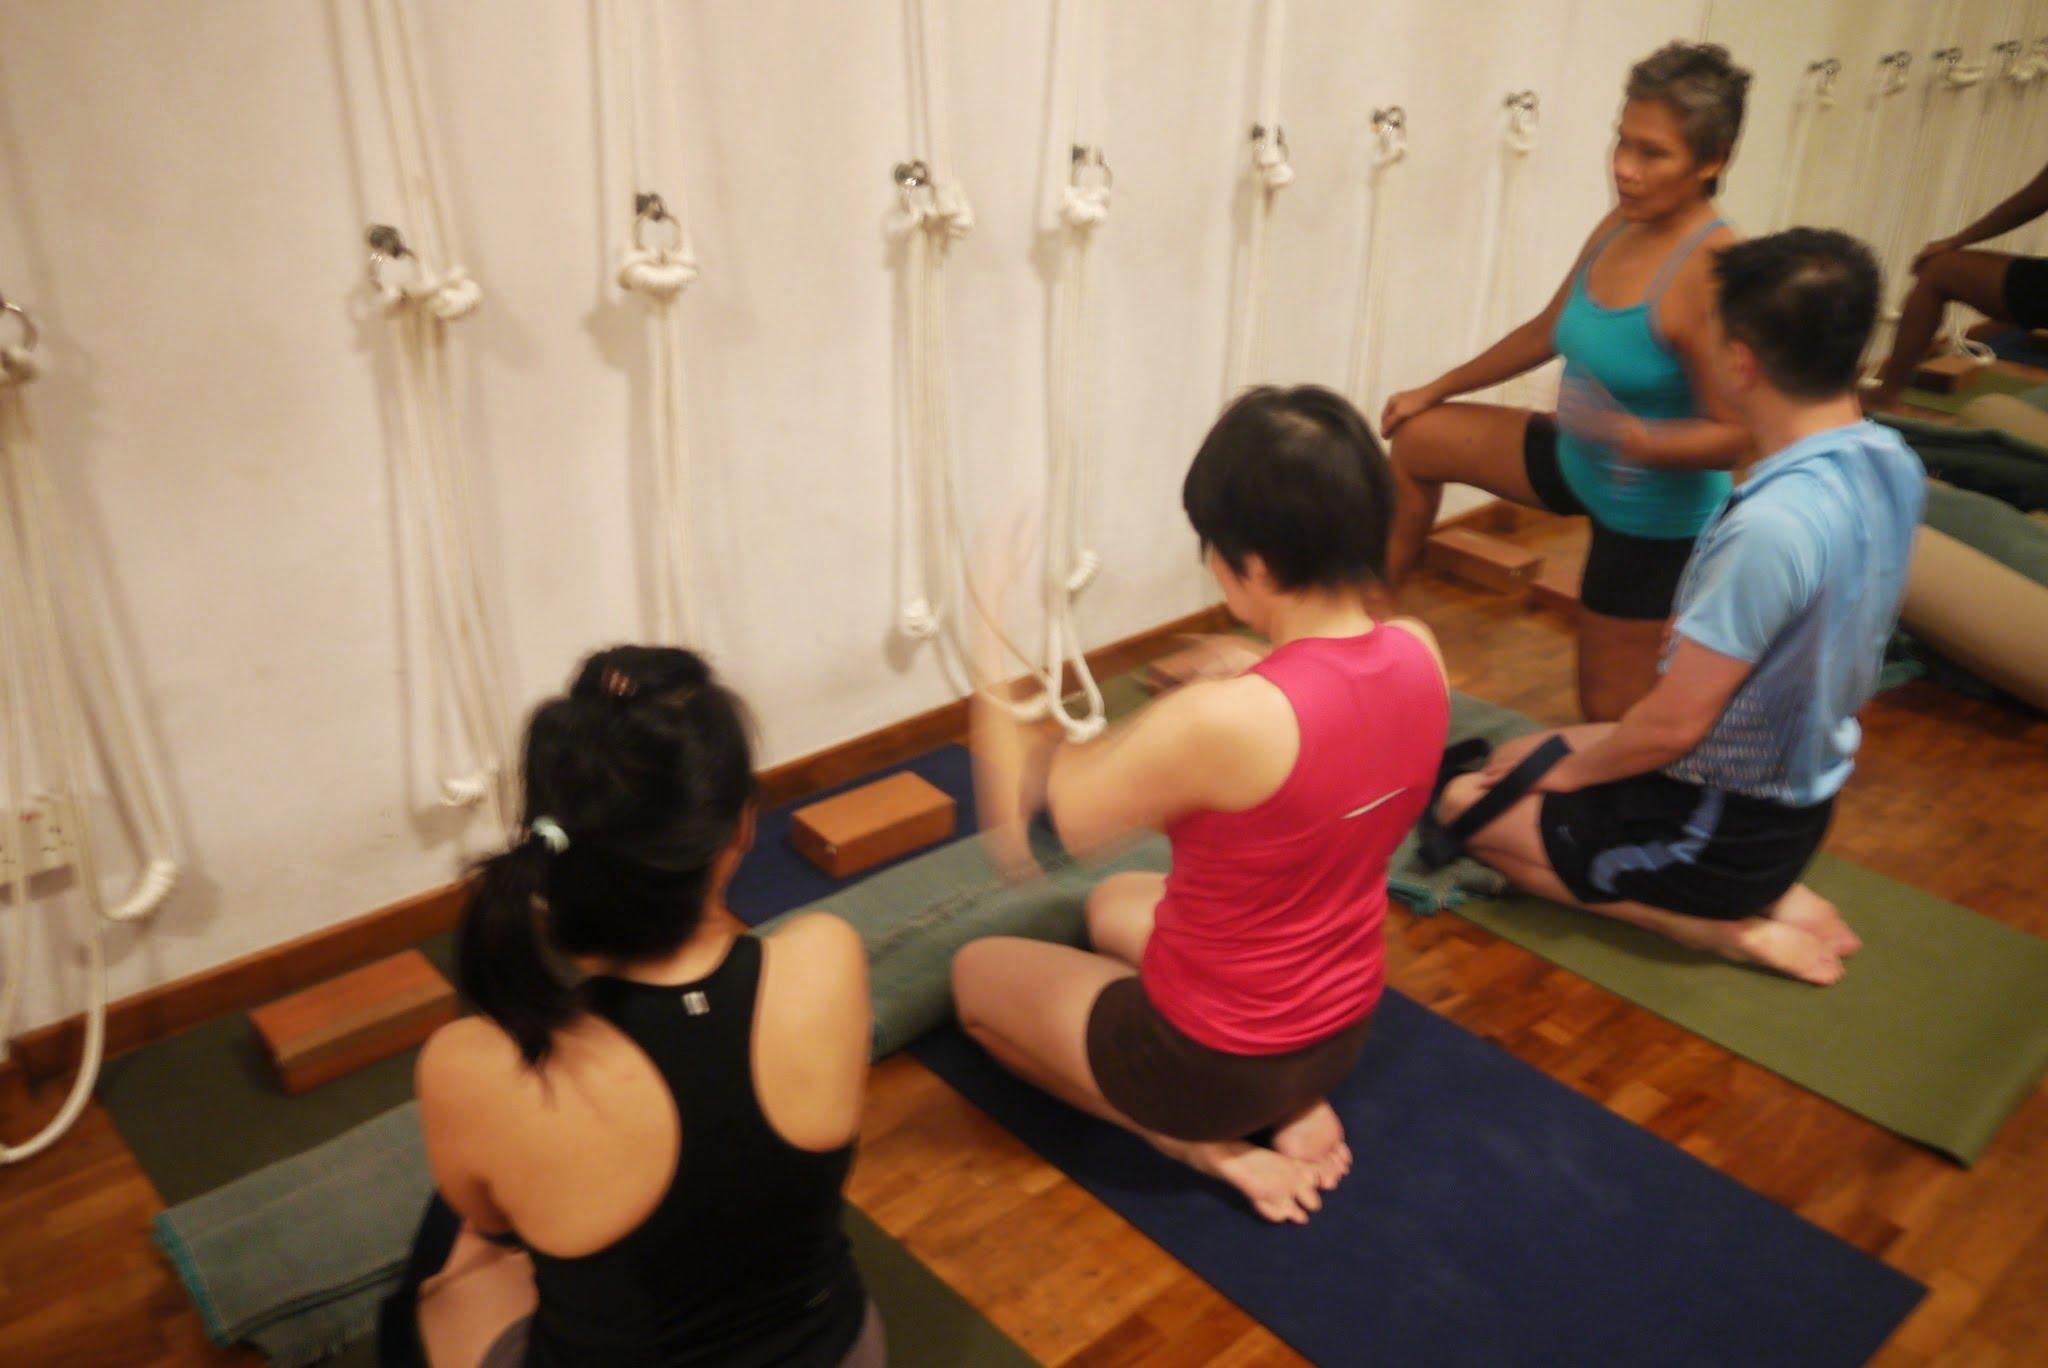 Mala teaching a yoga class